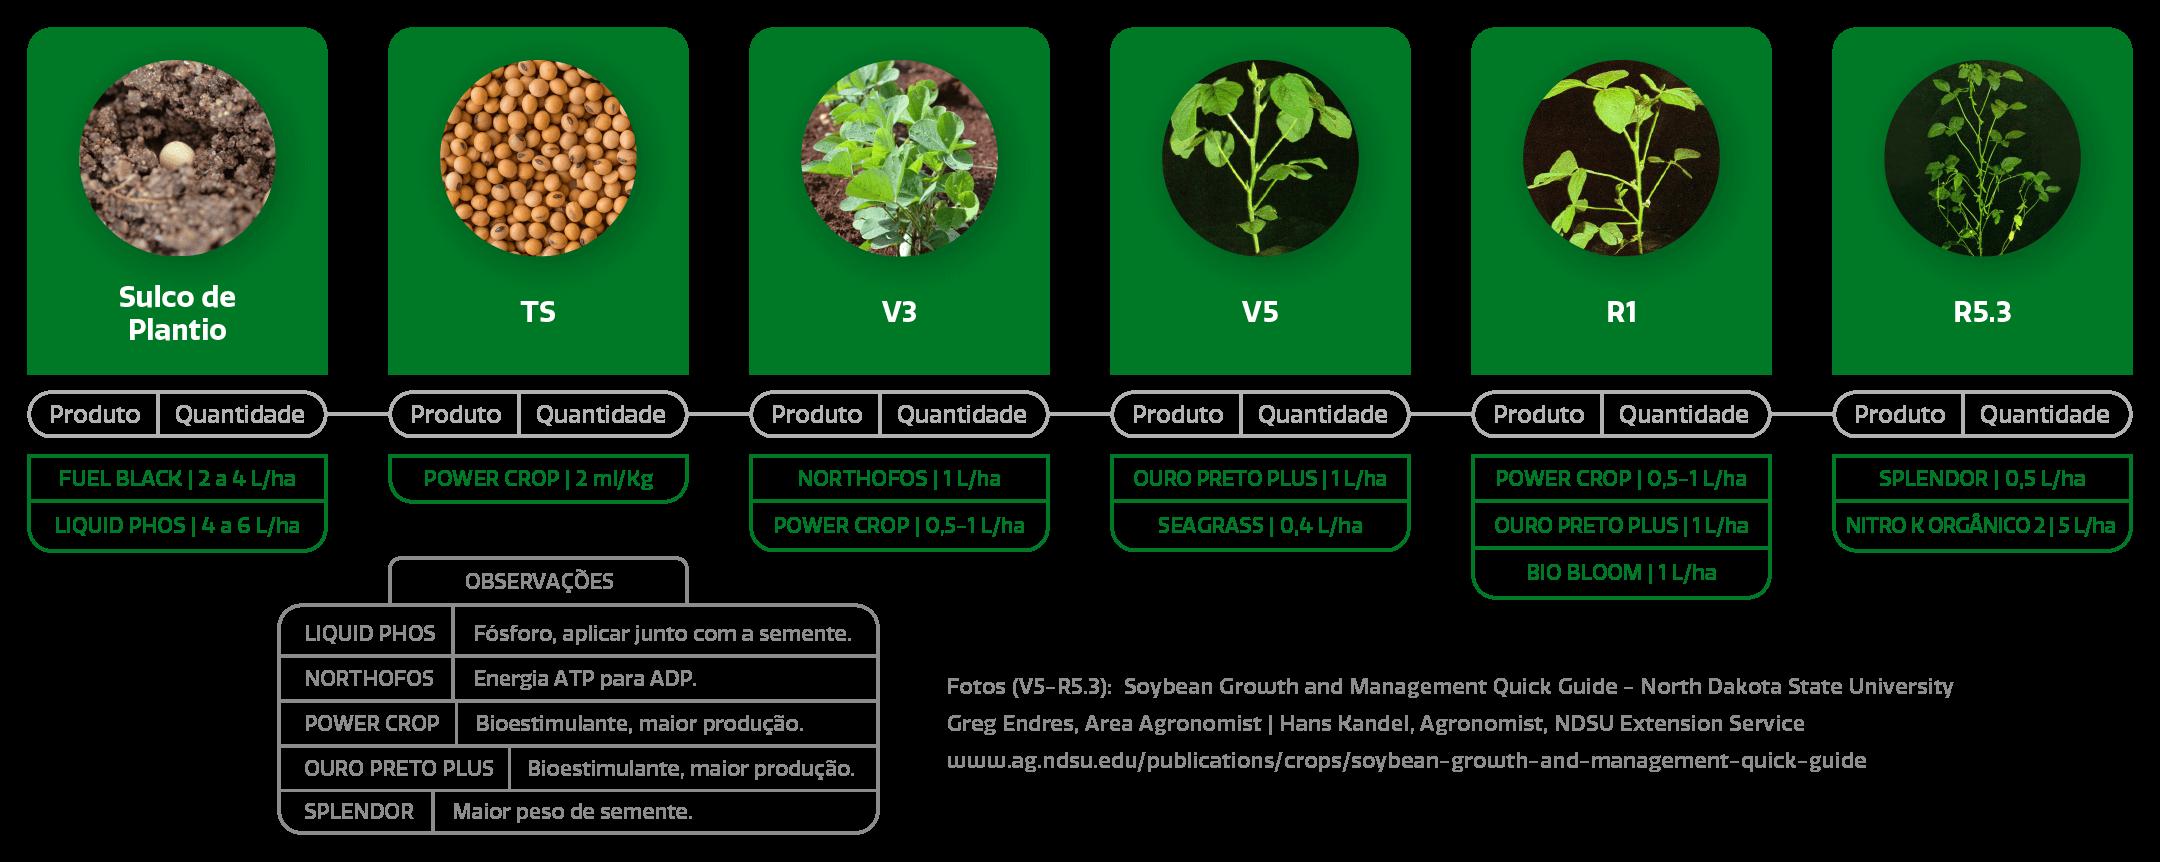 Amazon AgroSciences Páginas de Cultura Estágios da Soja Imagem Desktop Atualizada